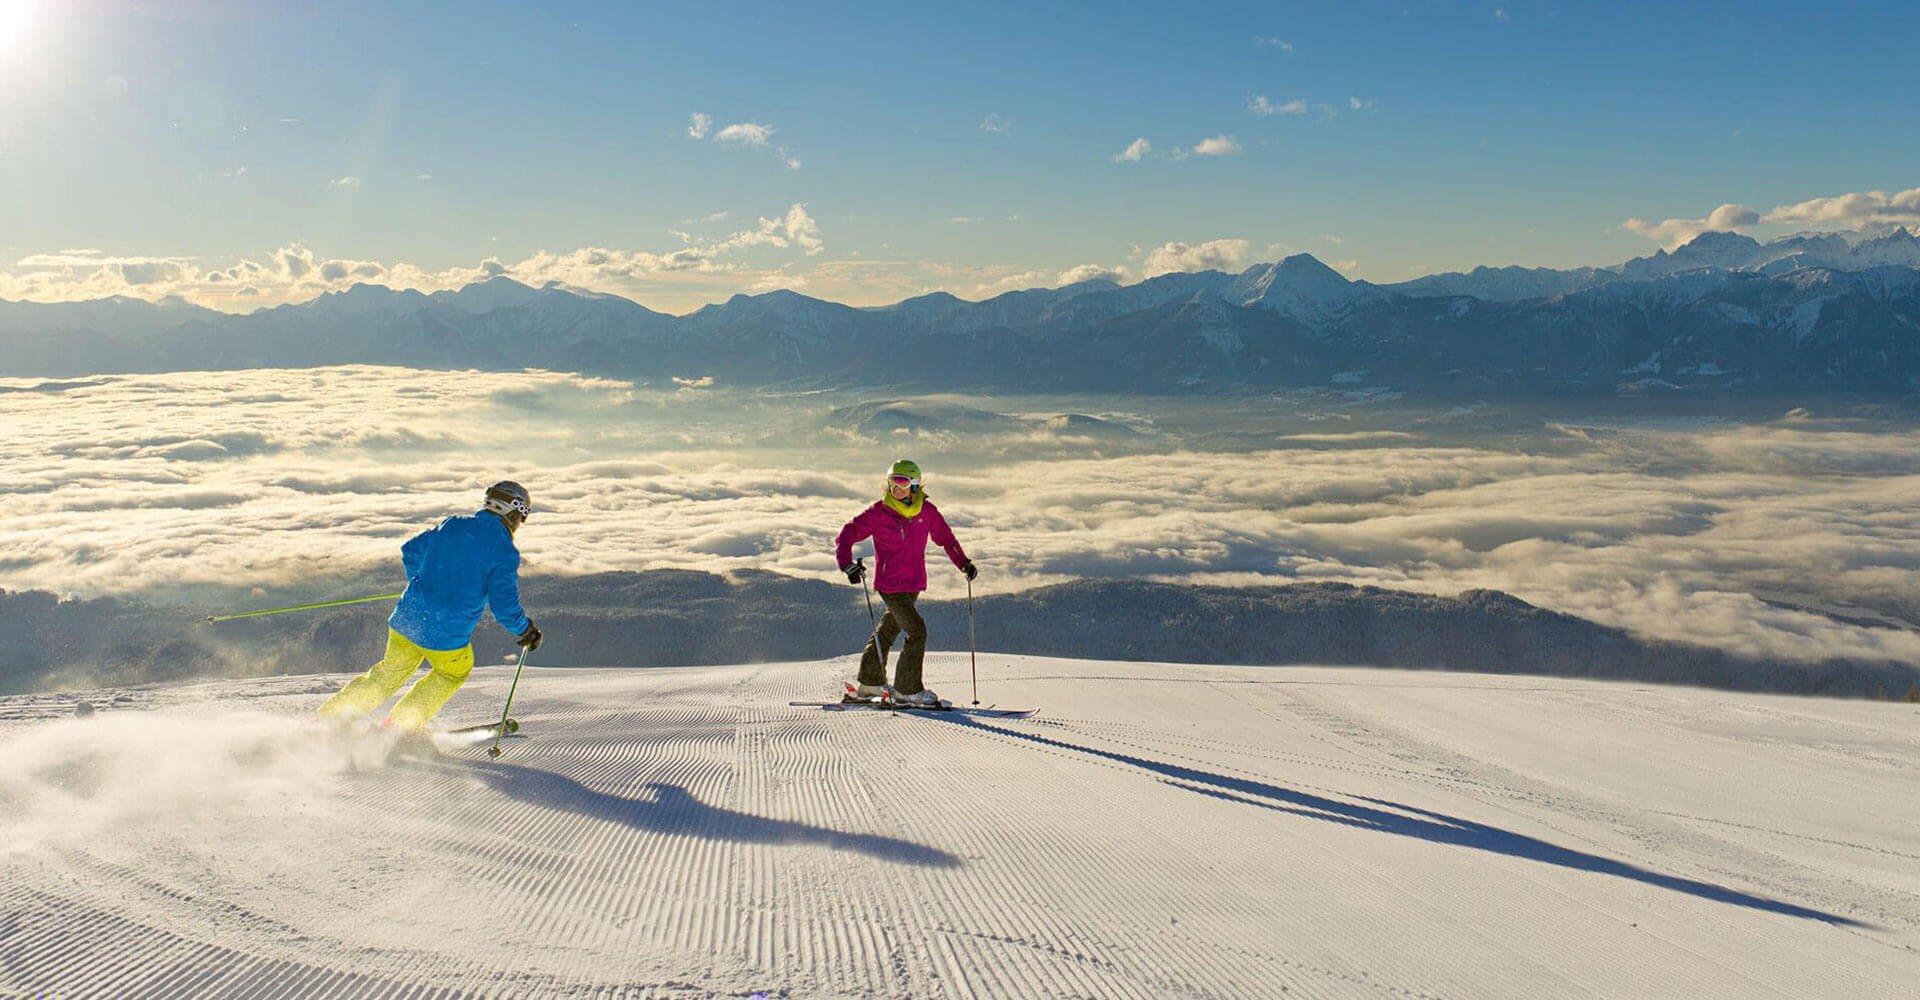 Pilsachhof - Winter fun in the heart of Carinthia